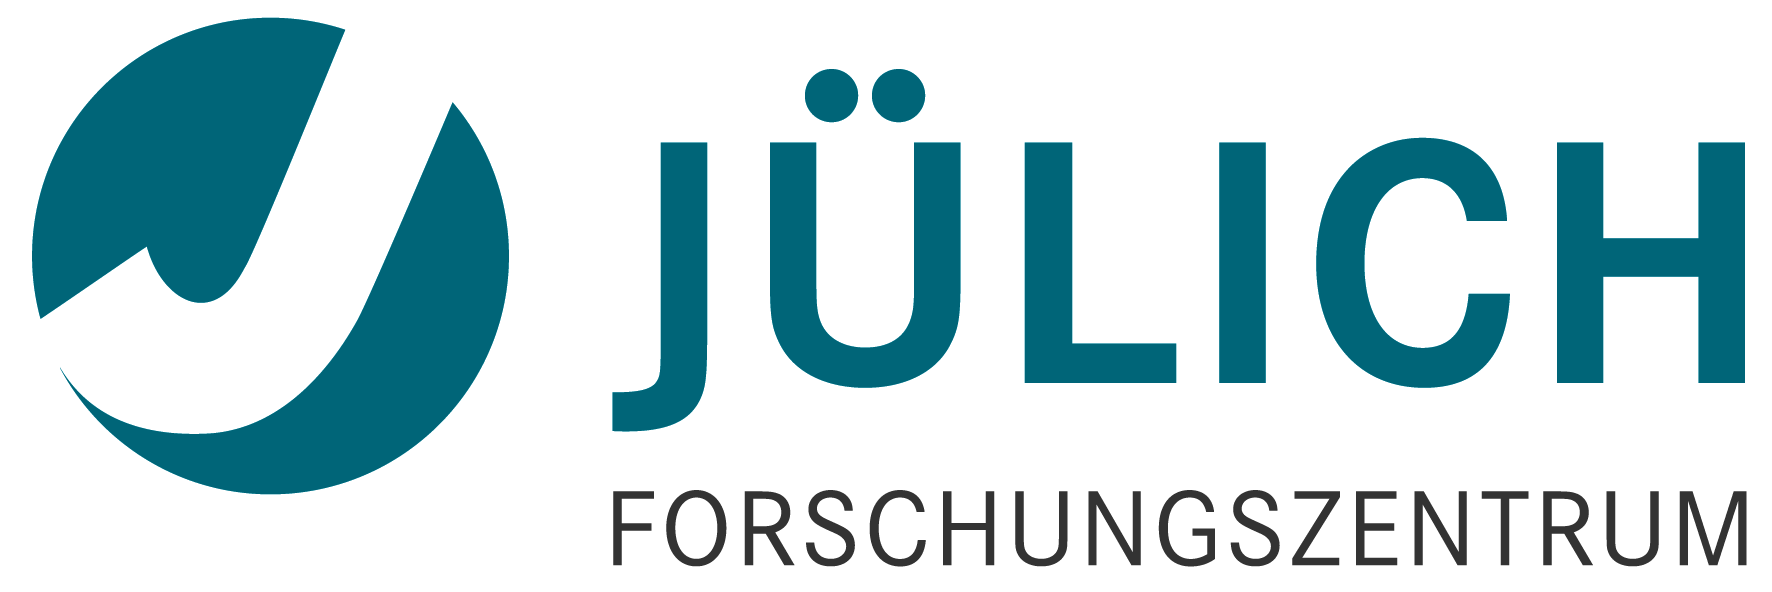 Logo_FZ_Juelich_cmyk_1772x592_tif